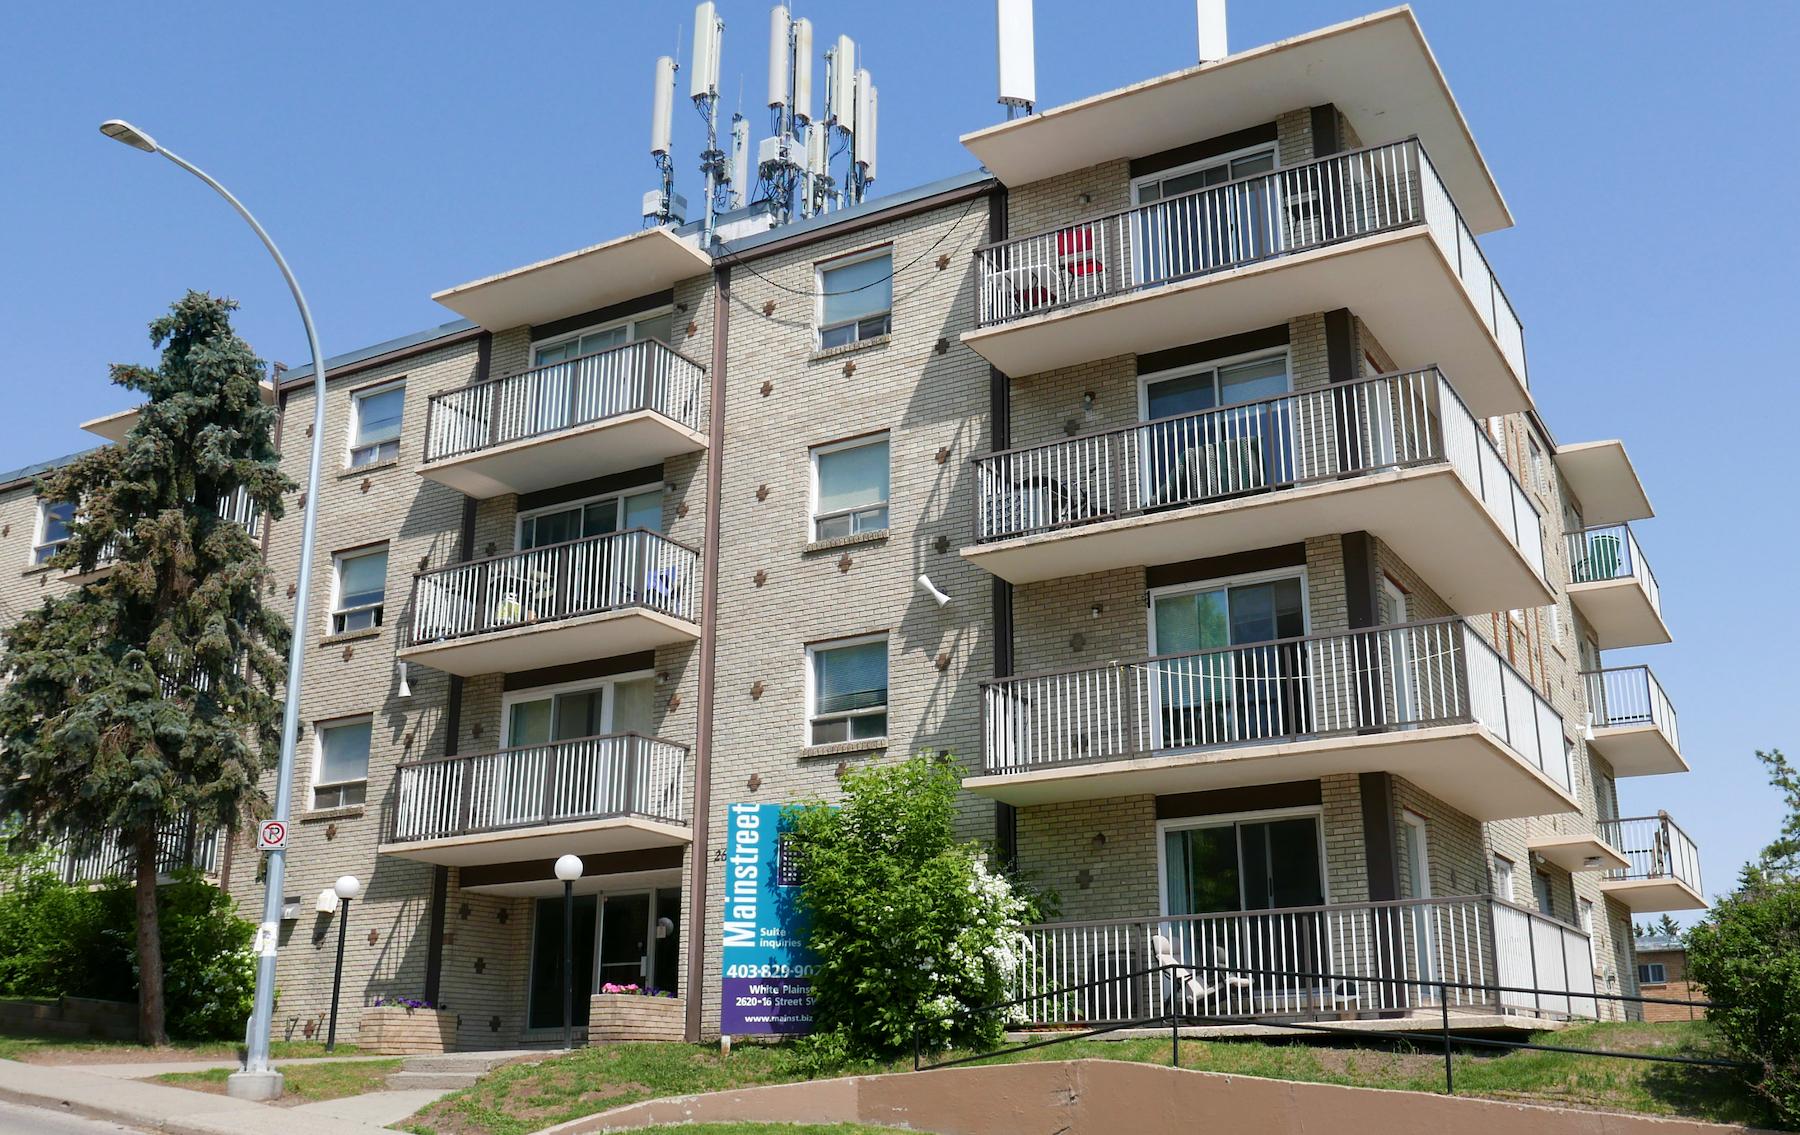 2620 16 Street SW, Calgary, AB - $1,025